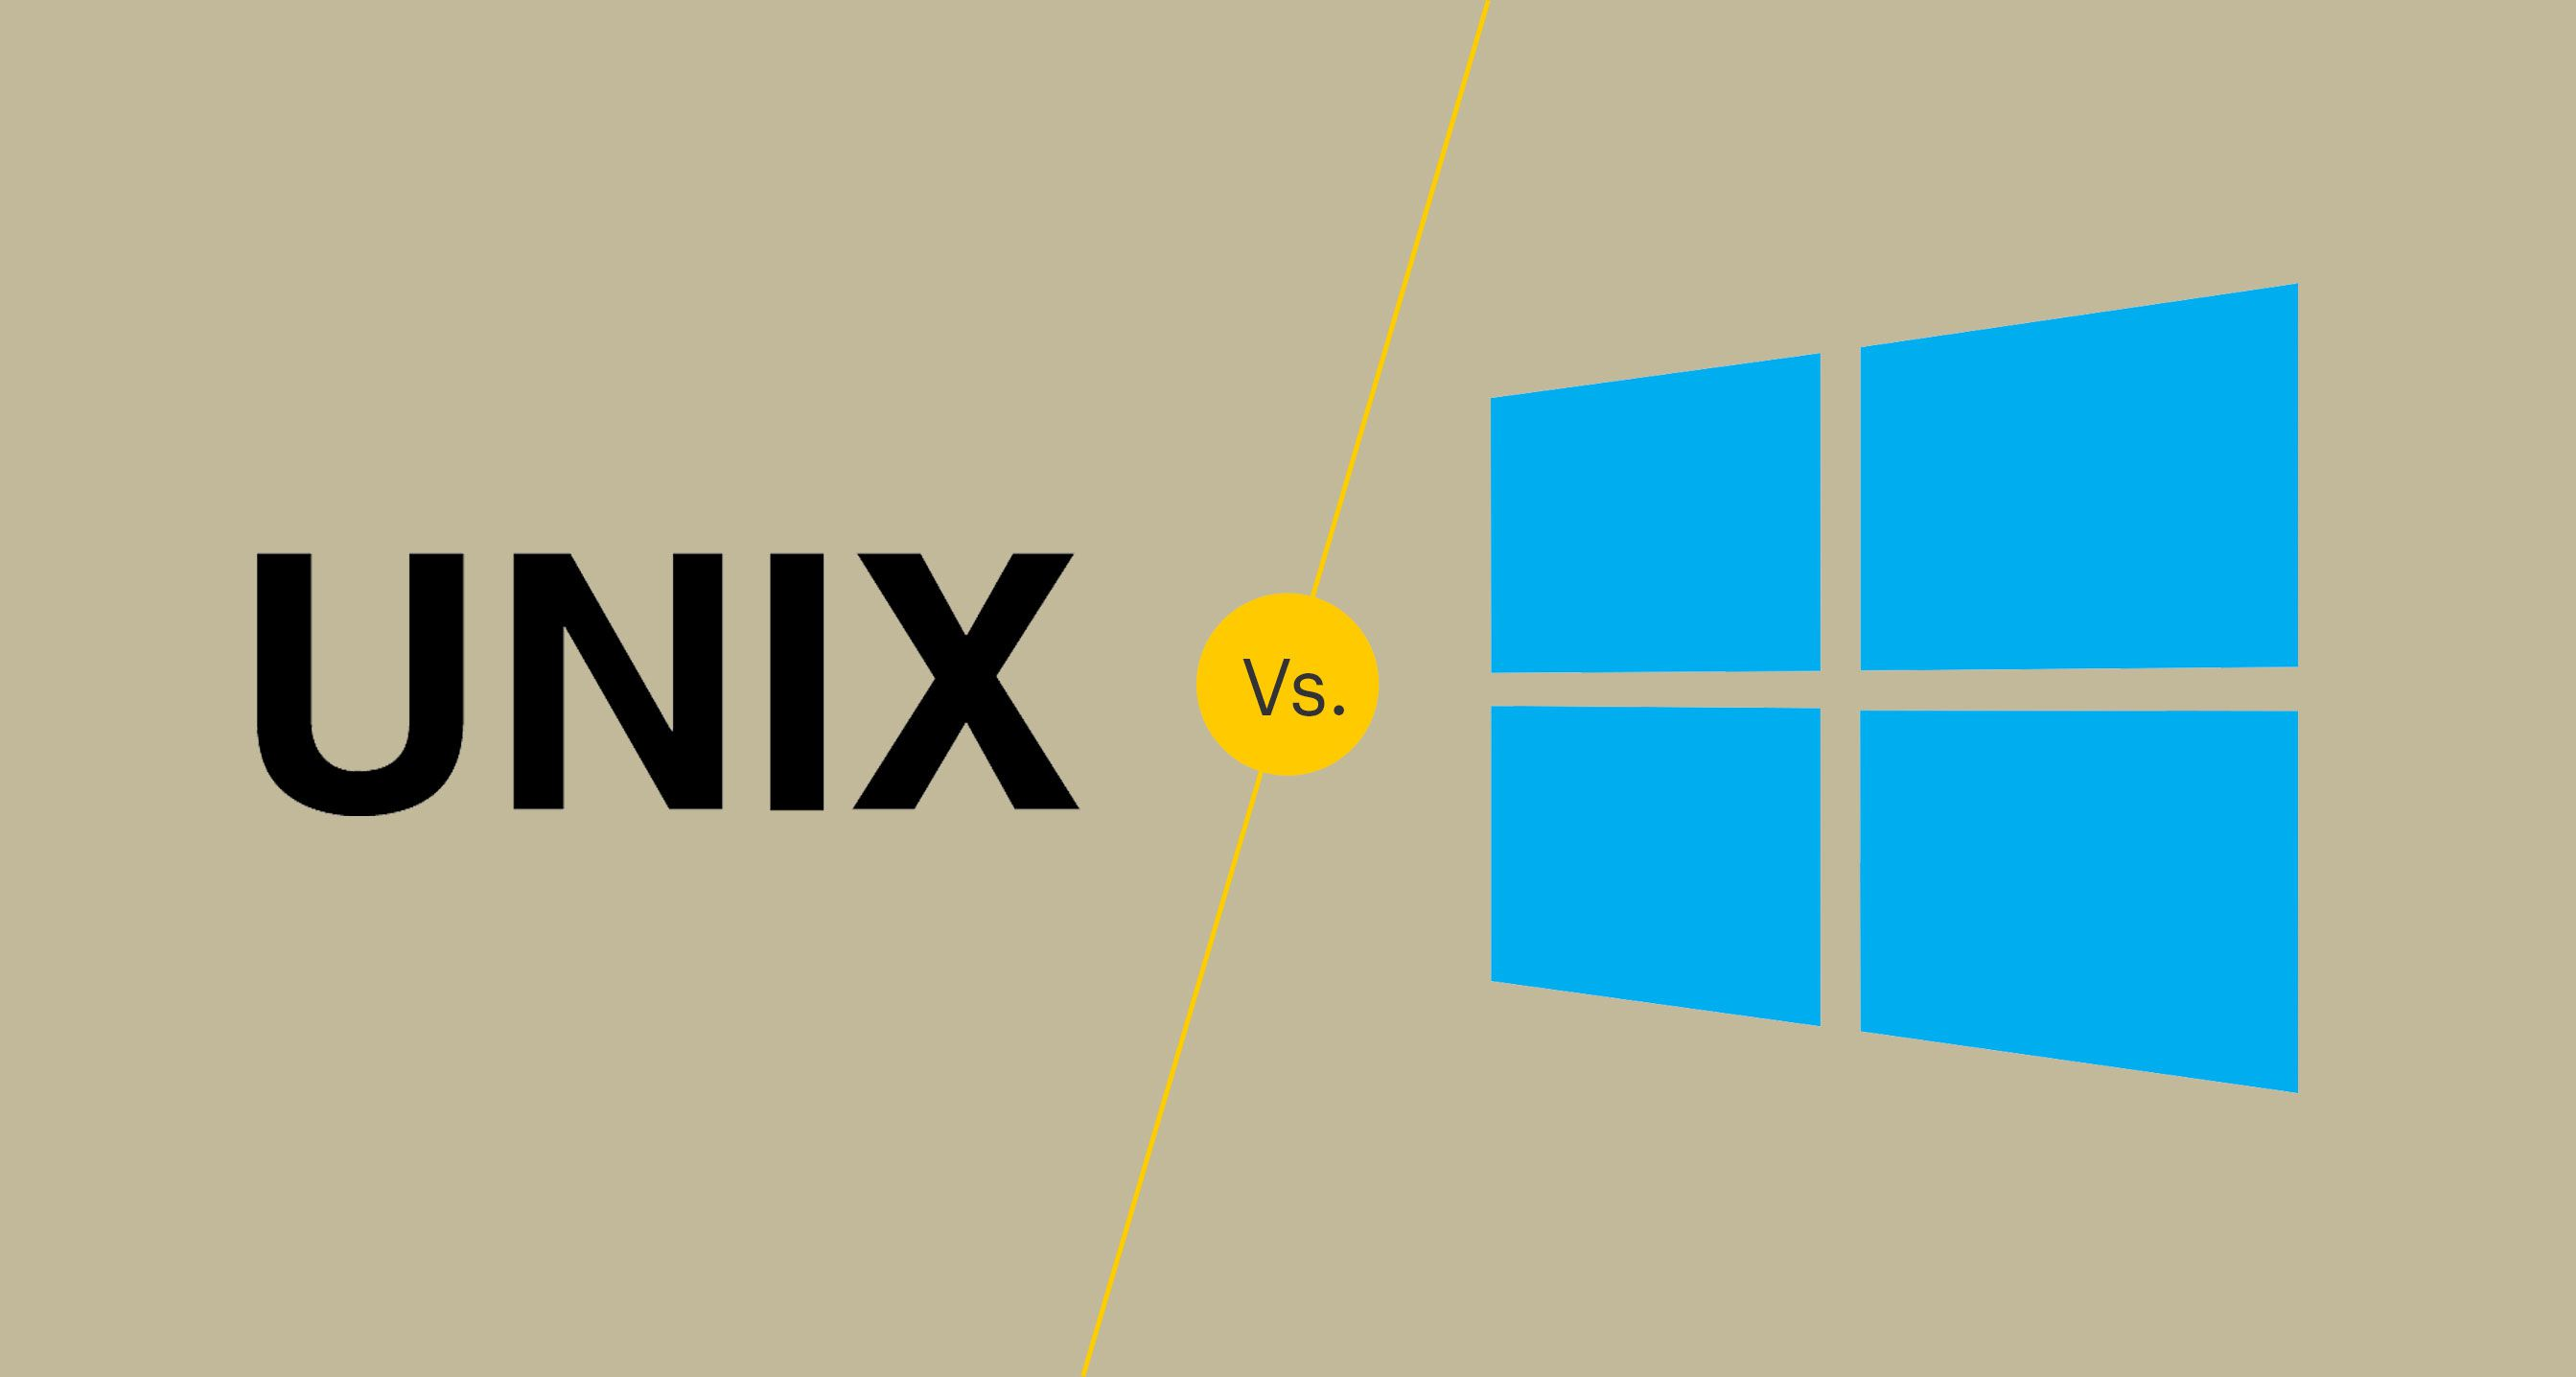 UNIX vs Windows